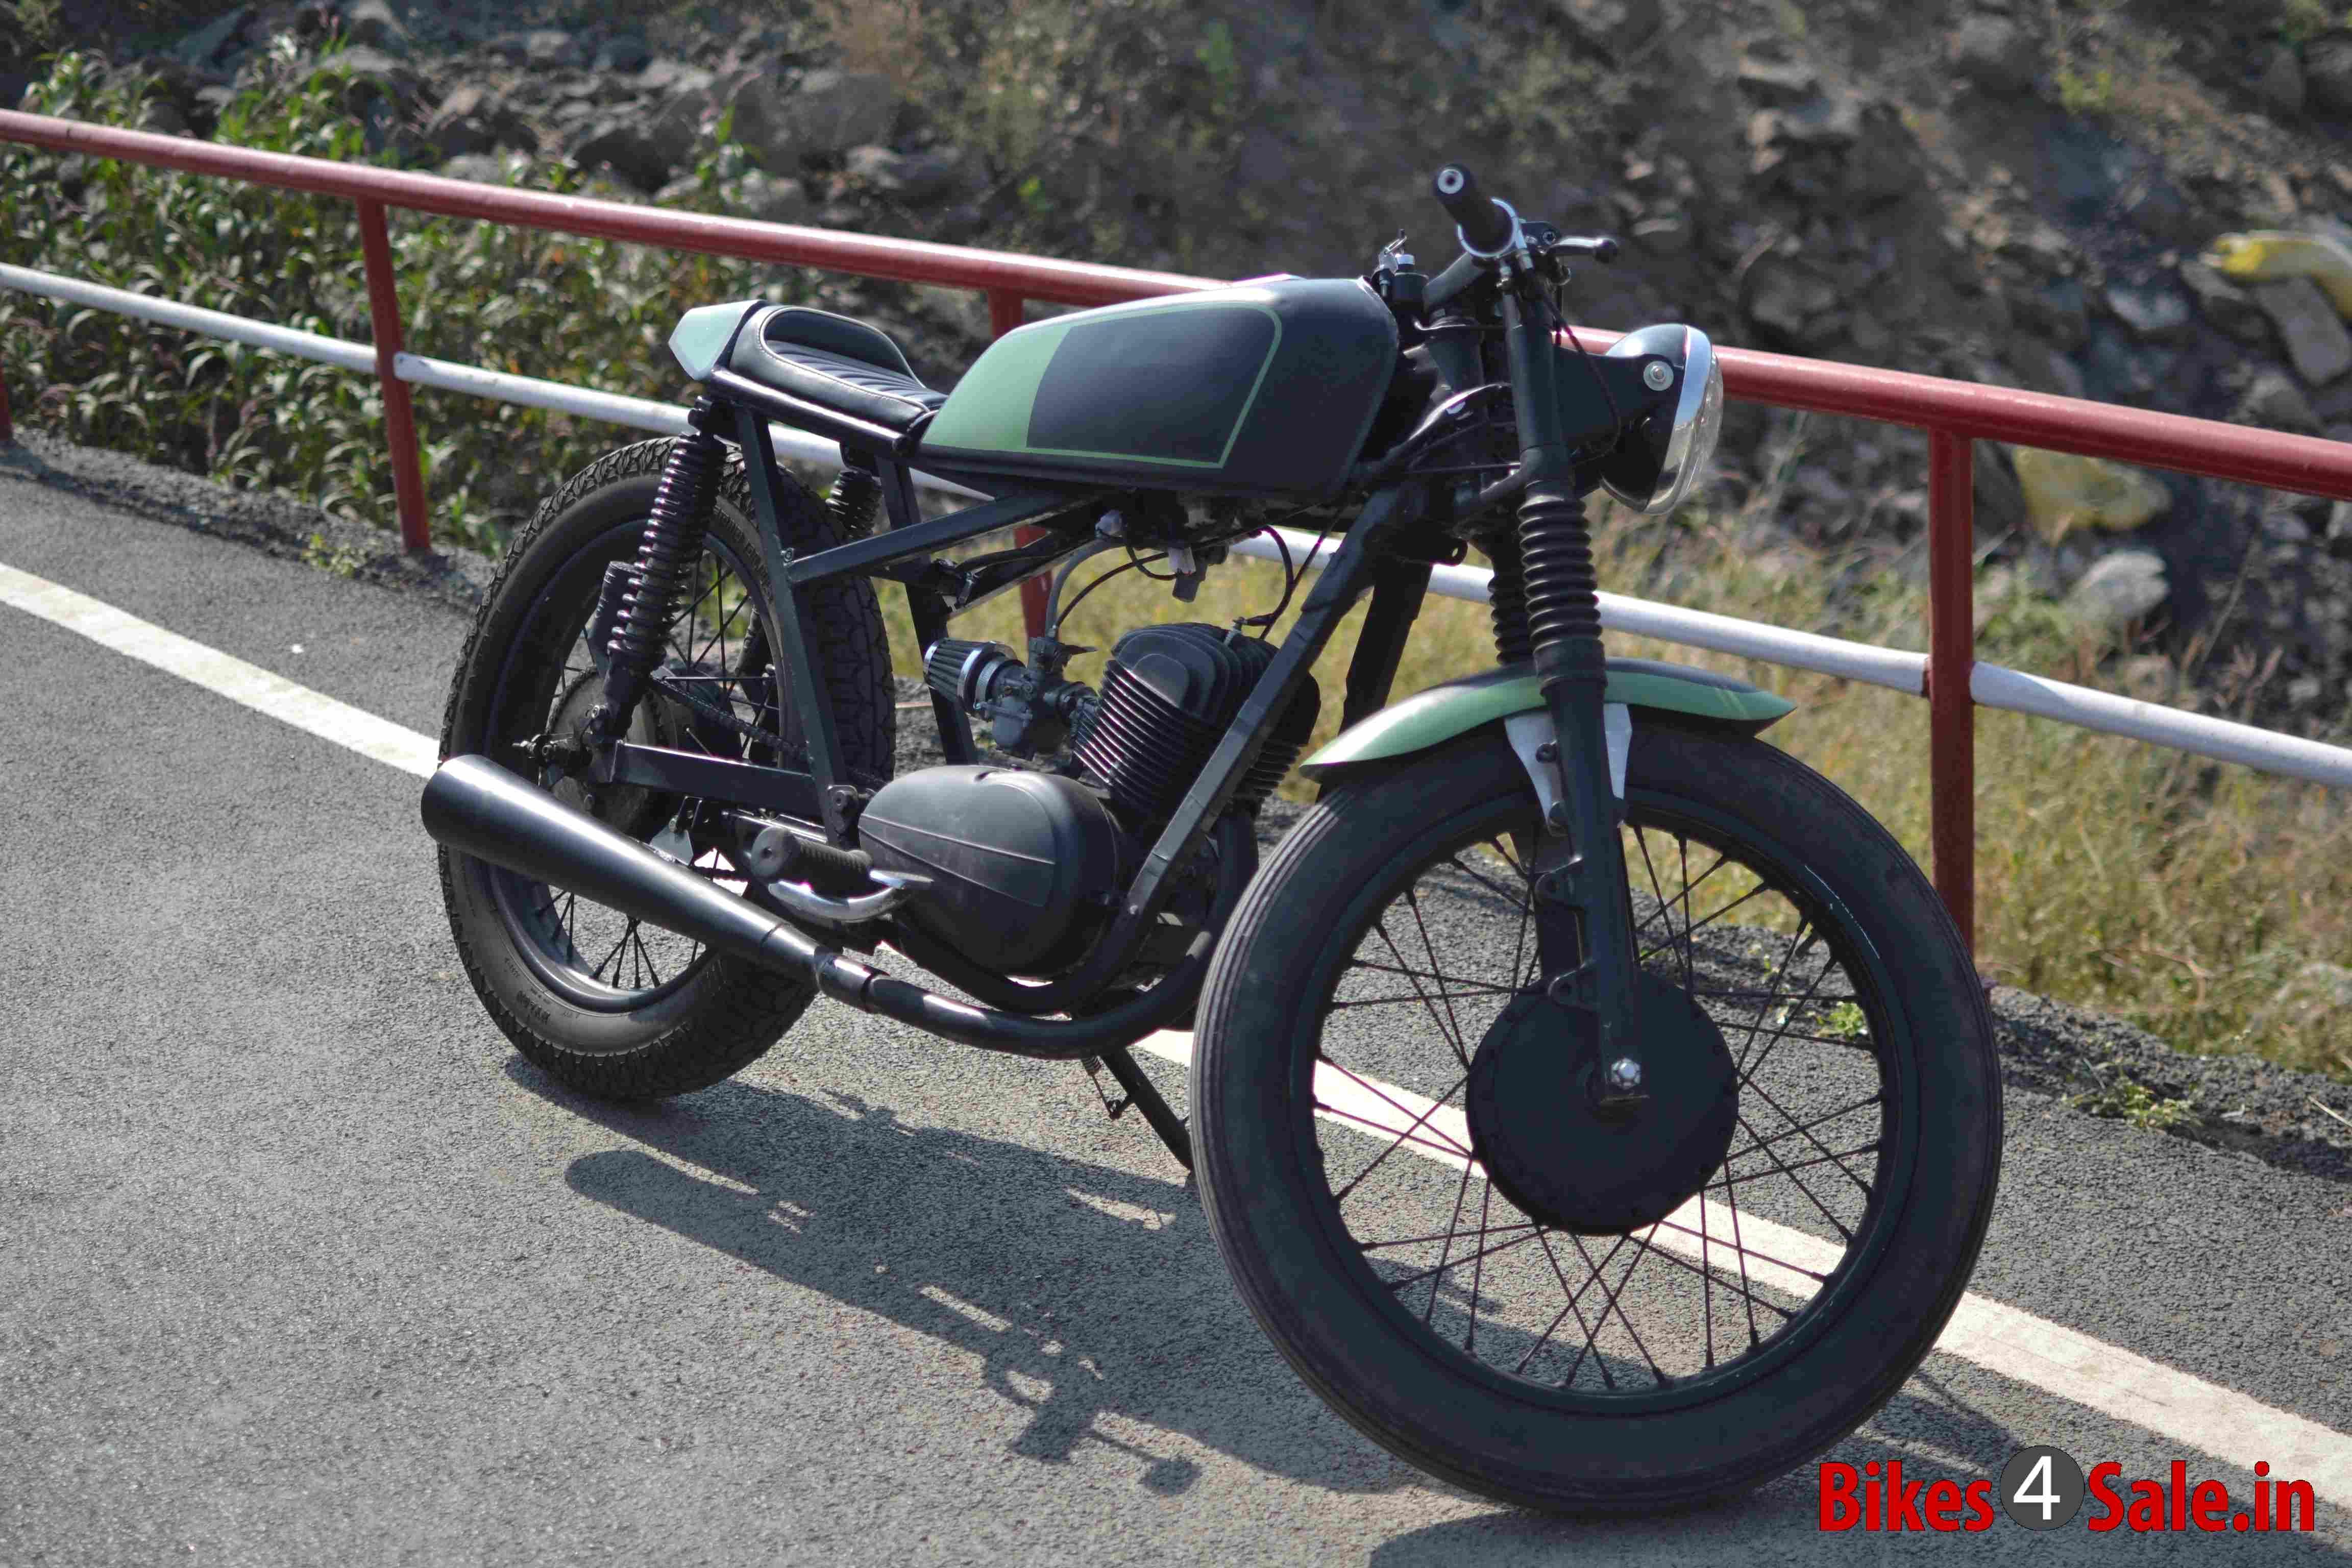 Custom Modified Rajdoot 175 cc Motorcycle. Bike, Cafe